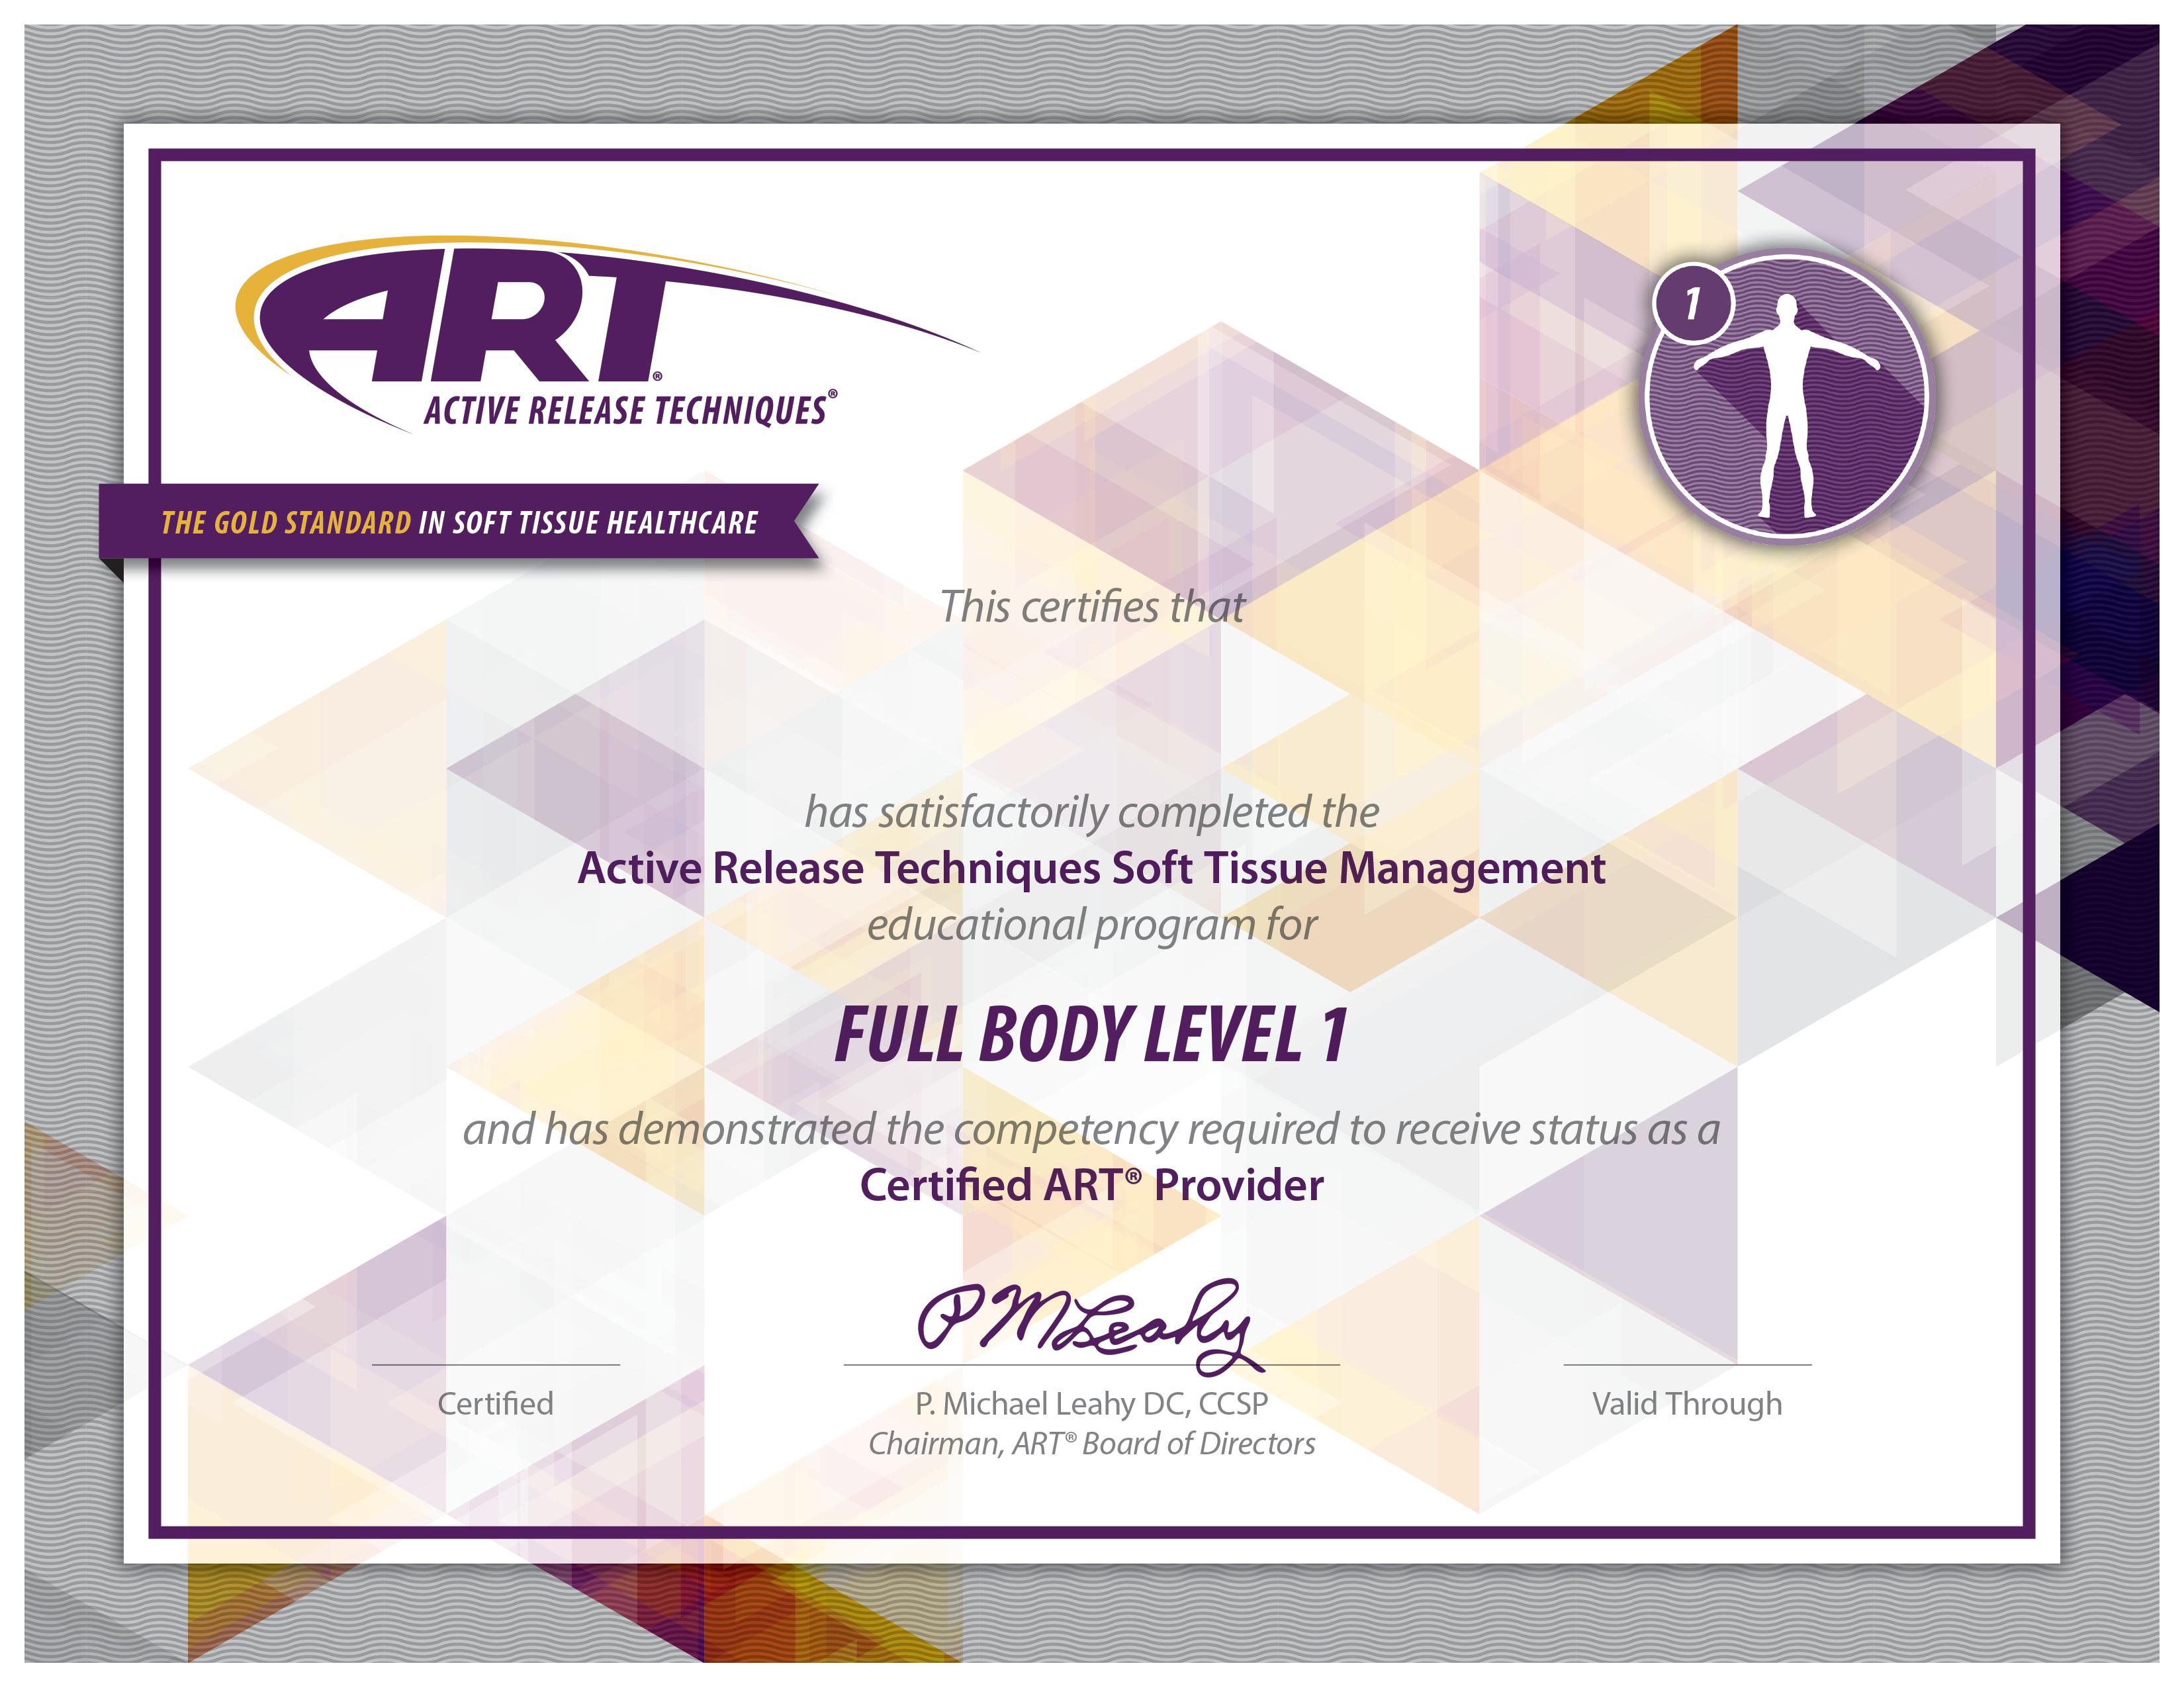 Le1 Fb Arlington Va Debby Standley Accredible Certificates